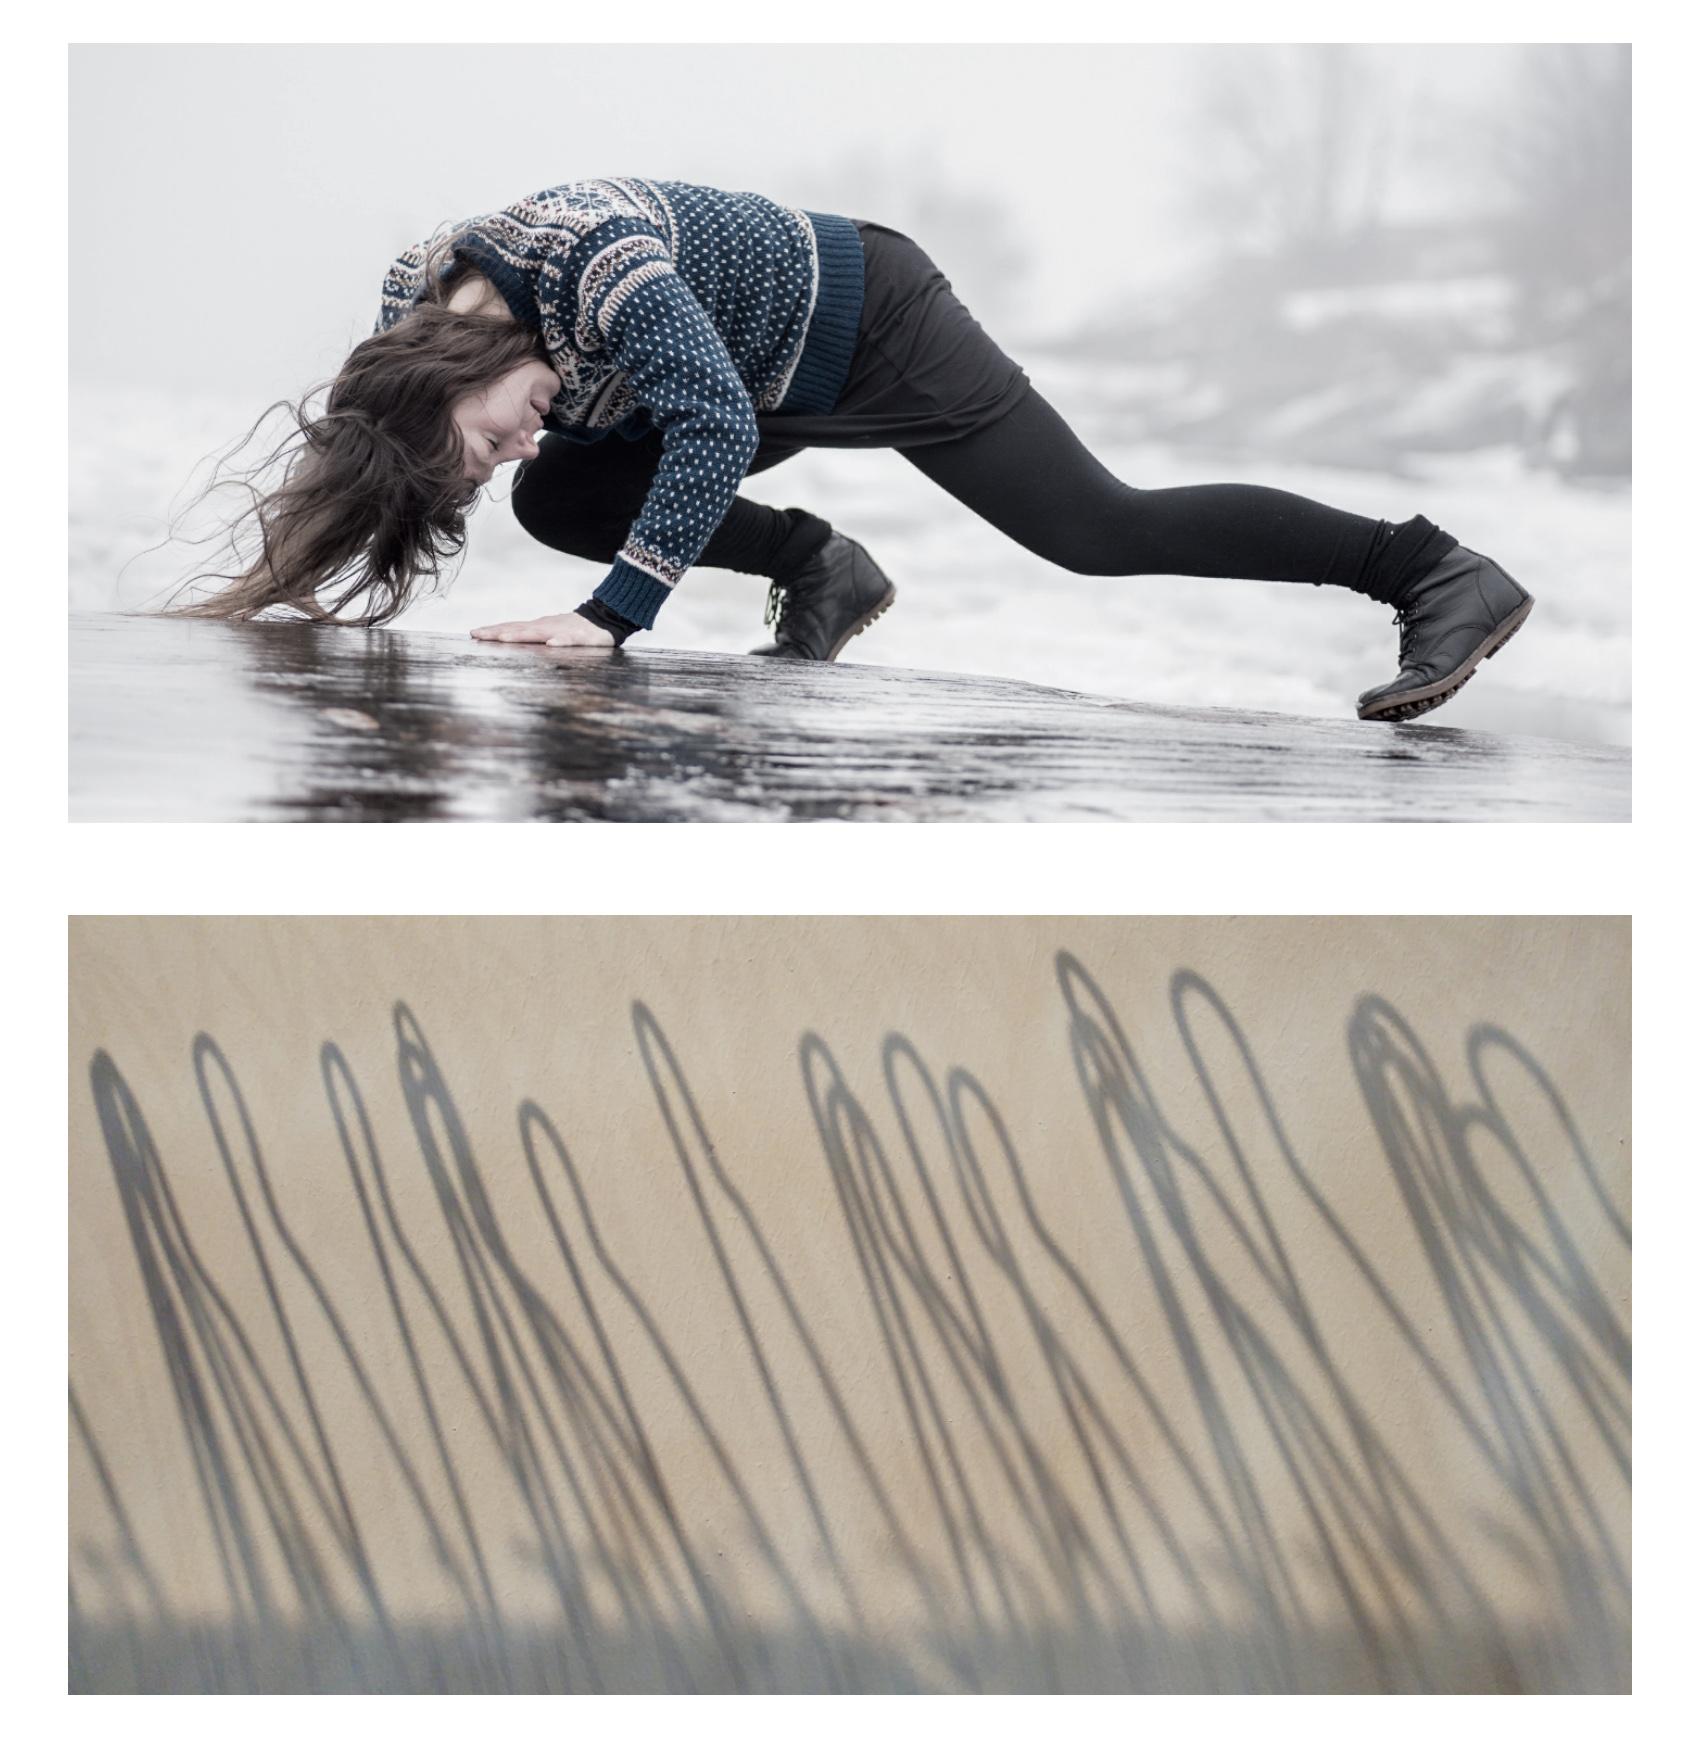 Photo 🅰:   SEA CHANGE SERIES     Uunisaari, Helsinki, Finland 2016 - dancer: Kristiina Turtiainen Photo 🅱:   HANGERS     The Place, London, UK - October 2016